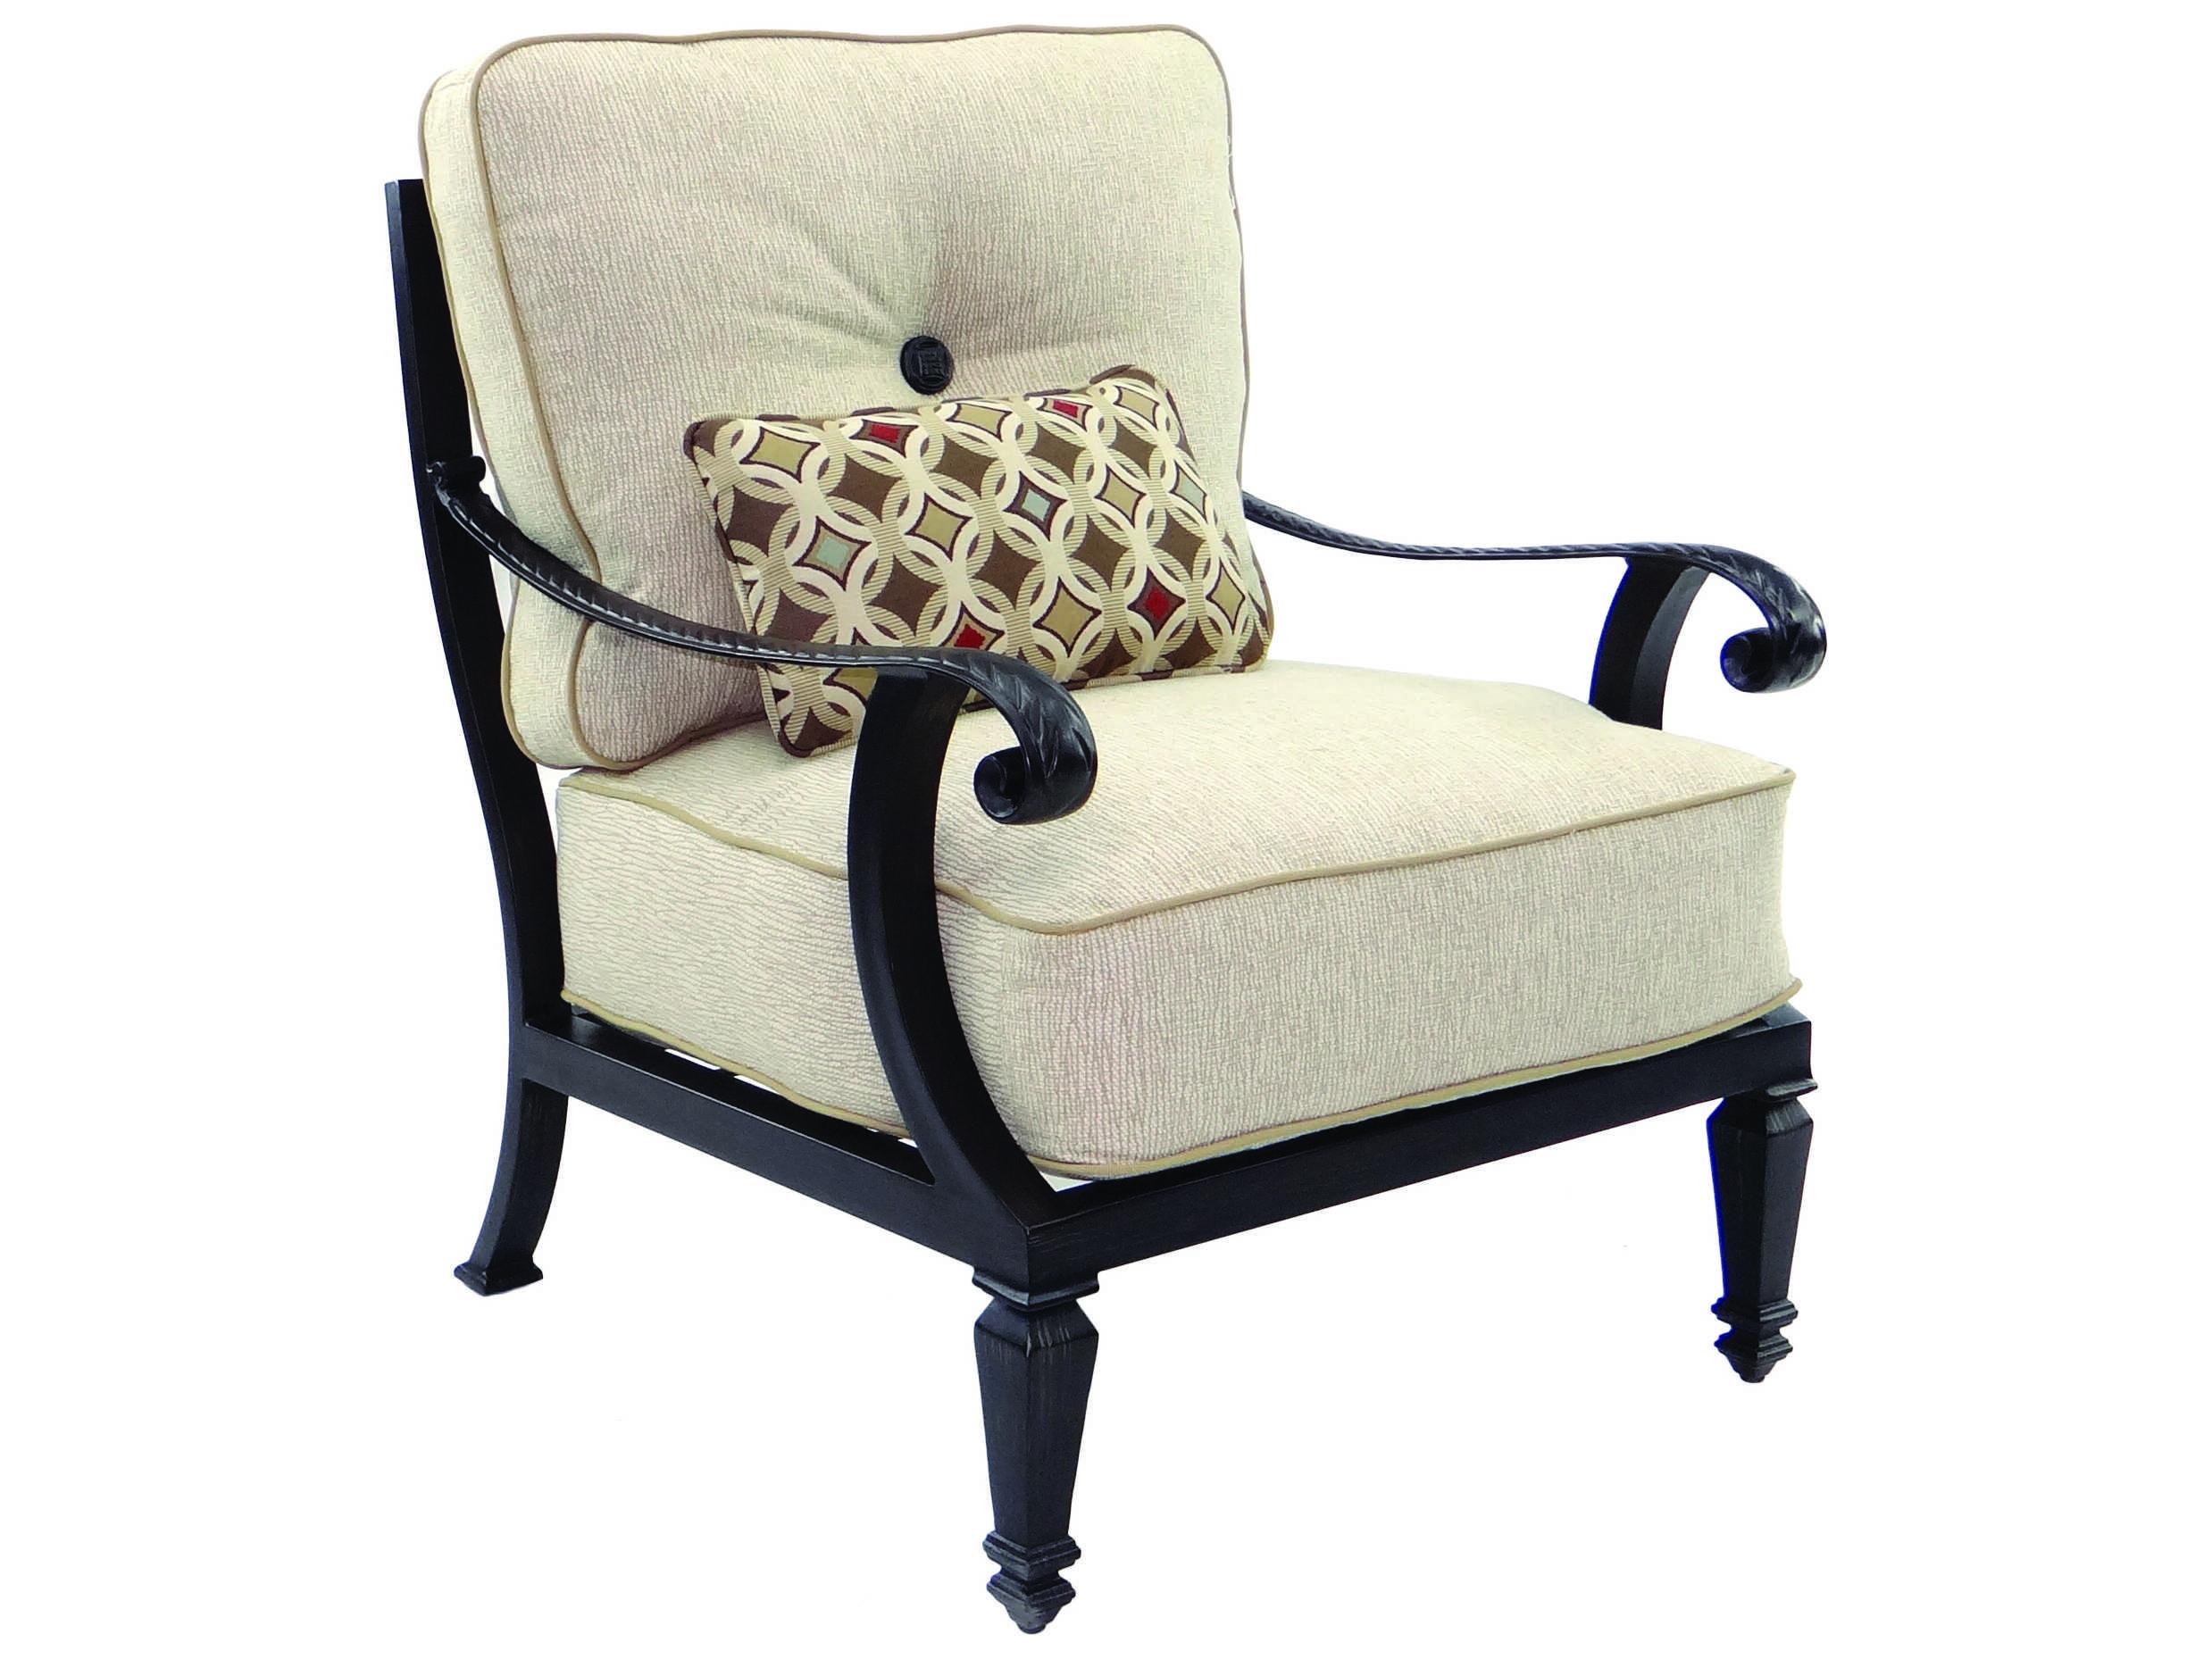 Castelle bellagio cushion cast aluminum lounge set for Bellagio chaise lounge